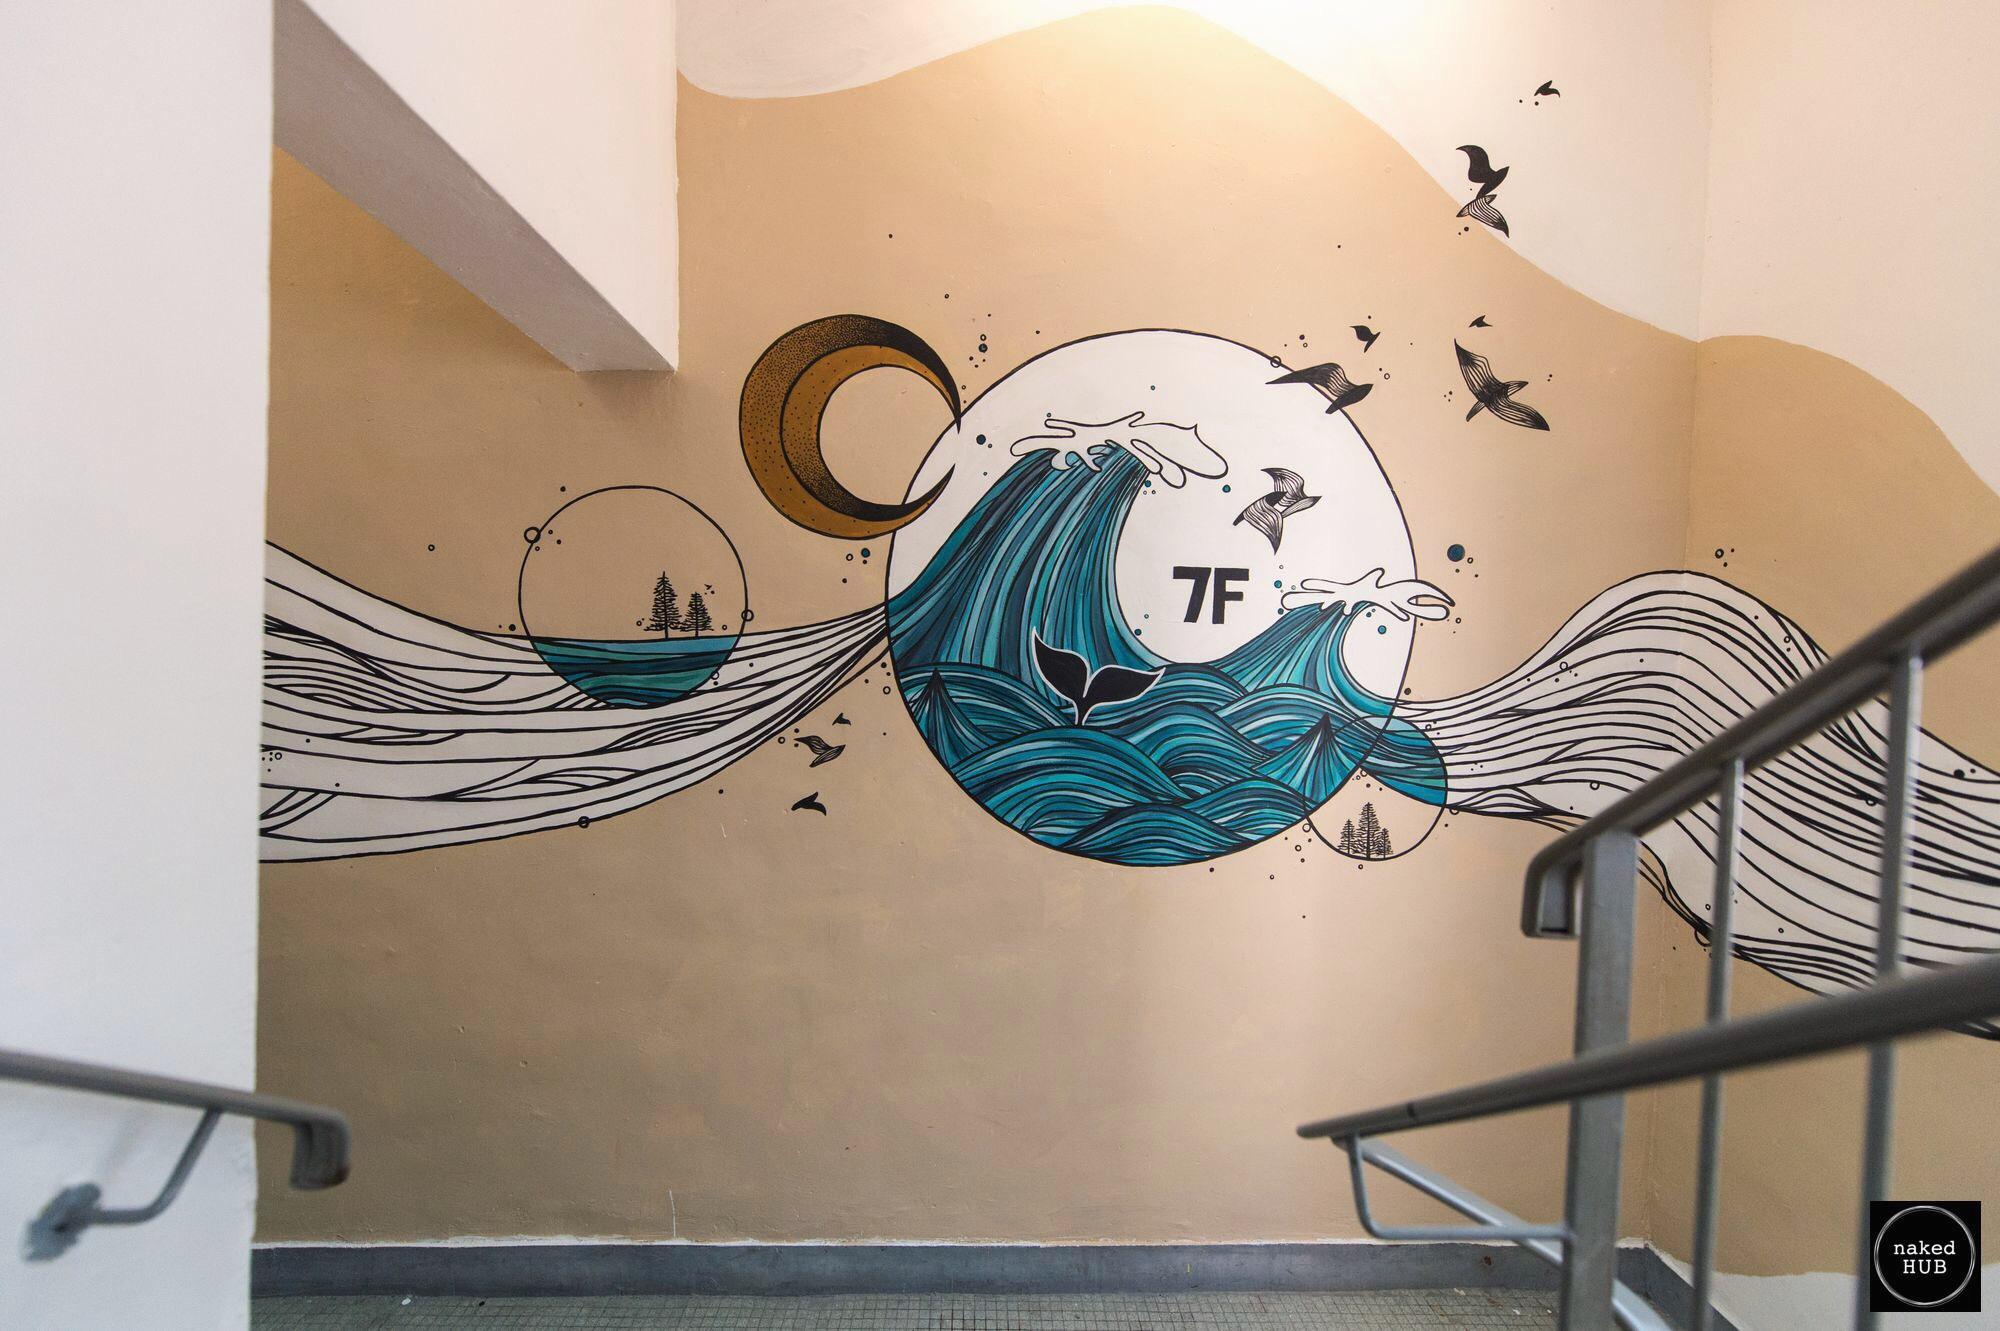 nHub Mural 4